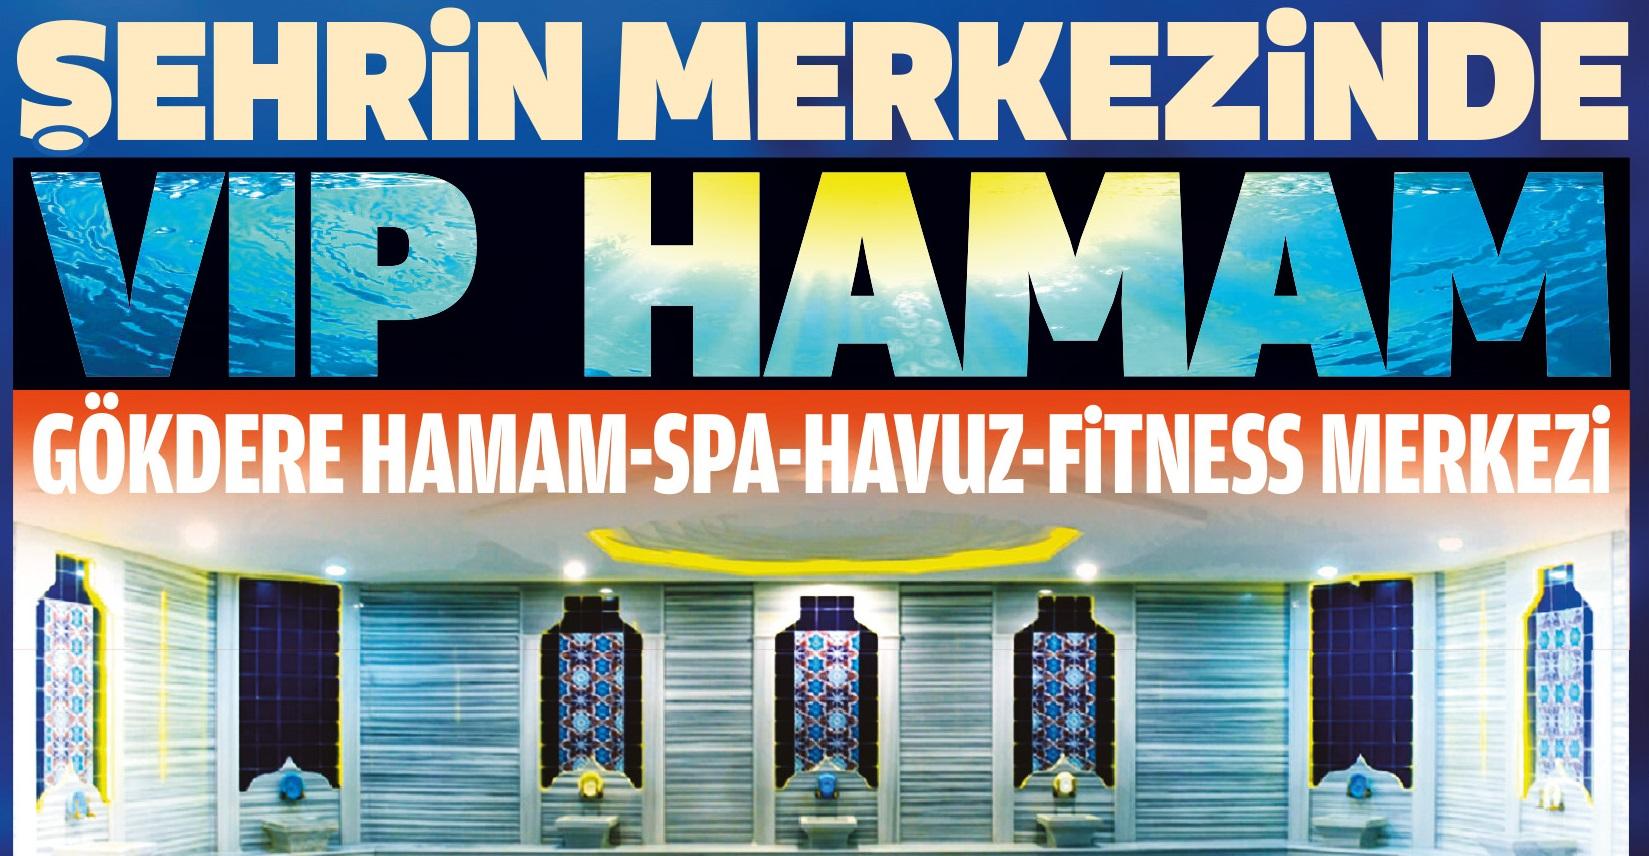 Şehrin merkezinde VIP hamam- Gökdere Hamam-Spa-Havuz-Fitness Merkezi